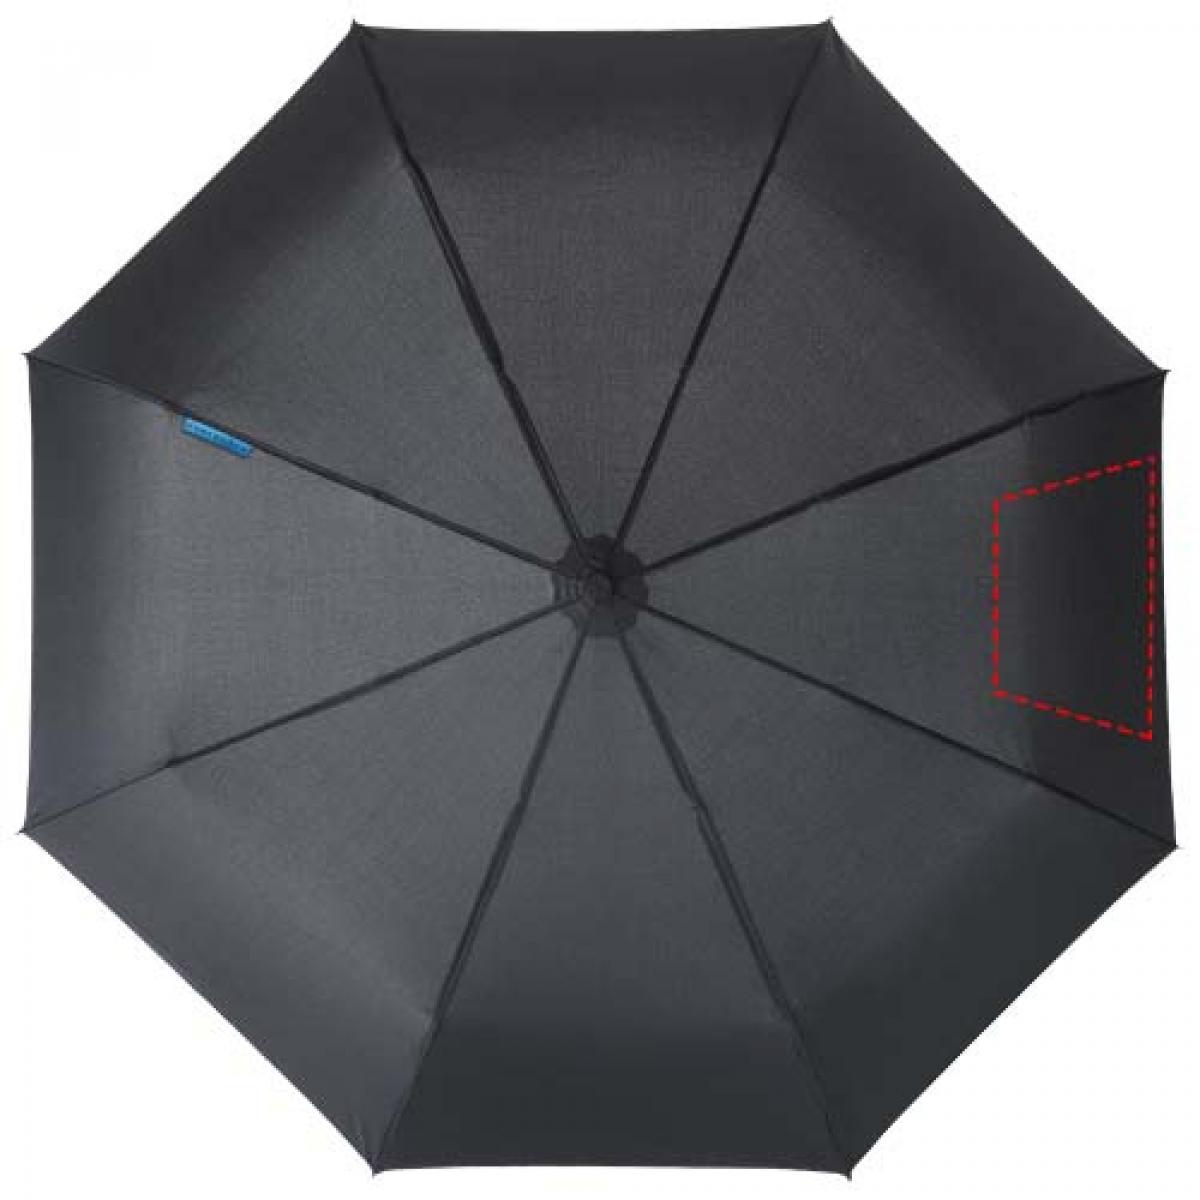 Marksman 3-delige opvouwbare paraplu - 5de paneel